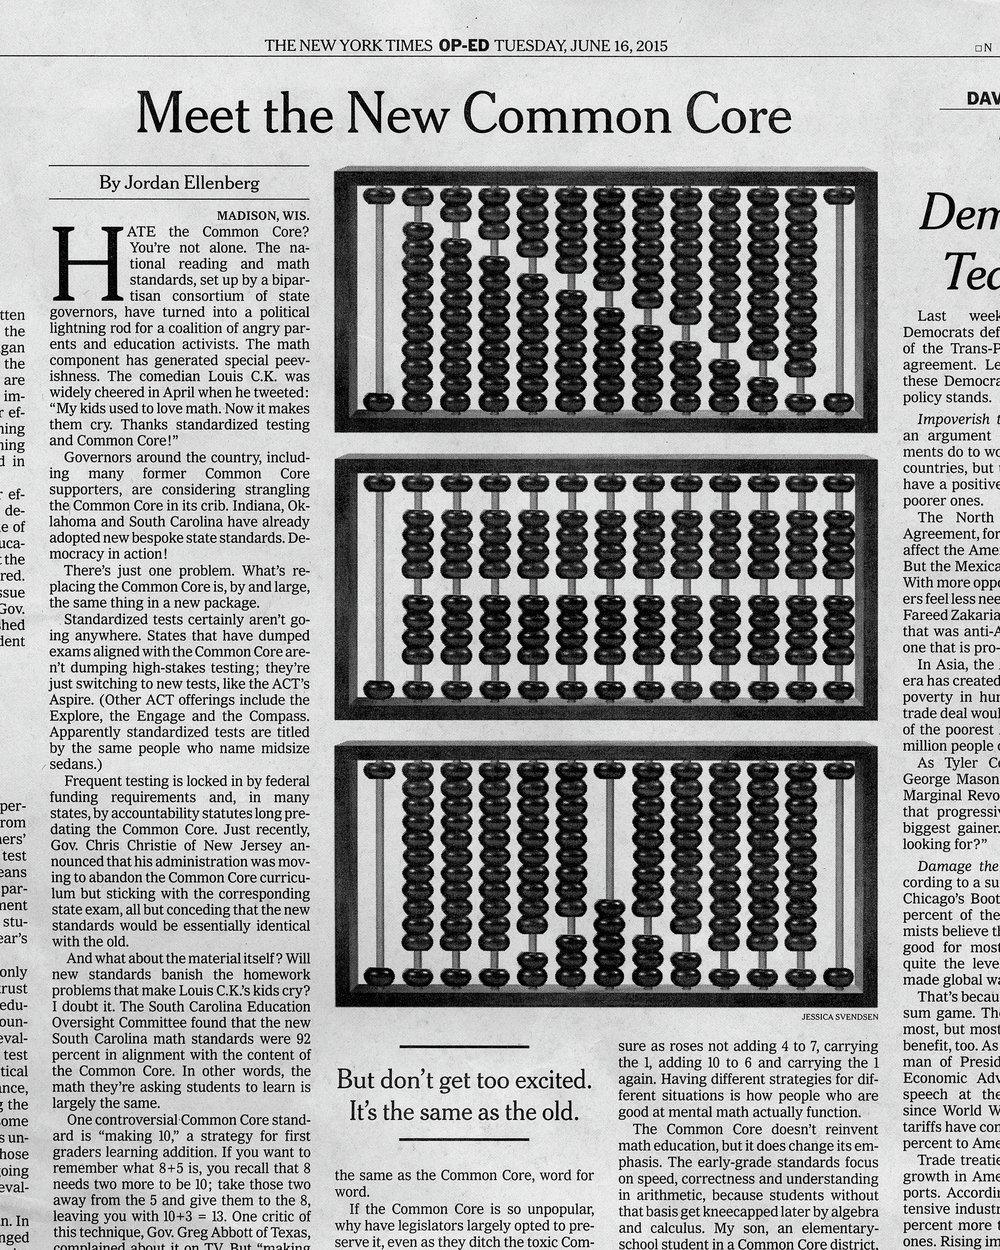 Ilustración para NYT   —Jessica Svendsen